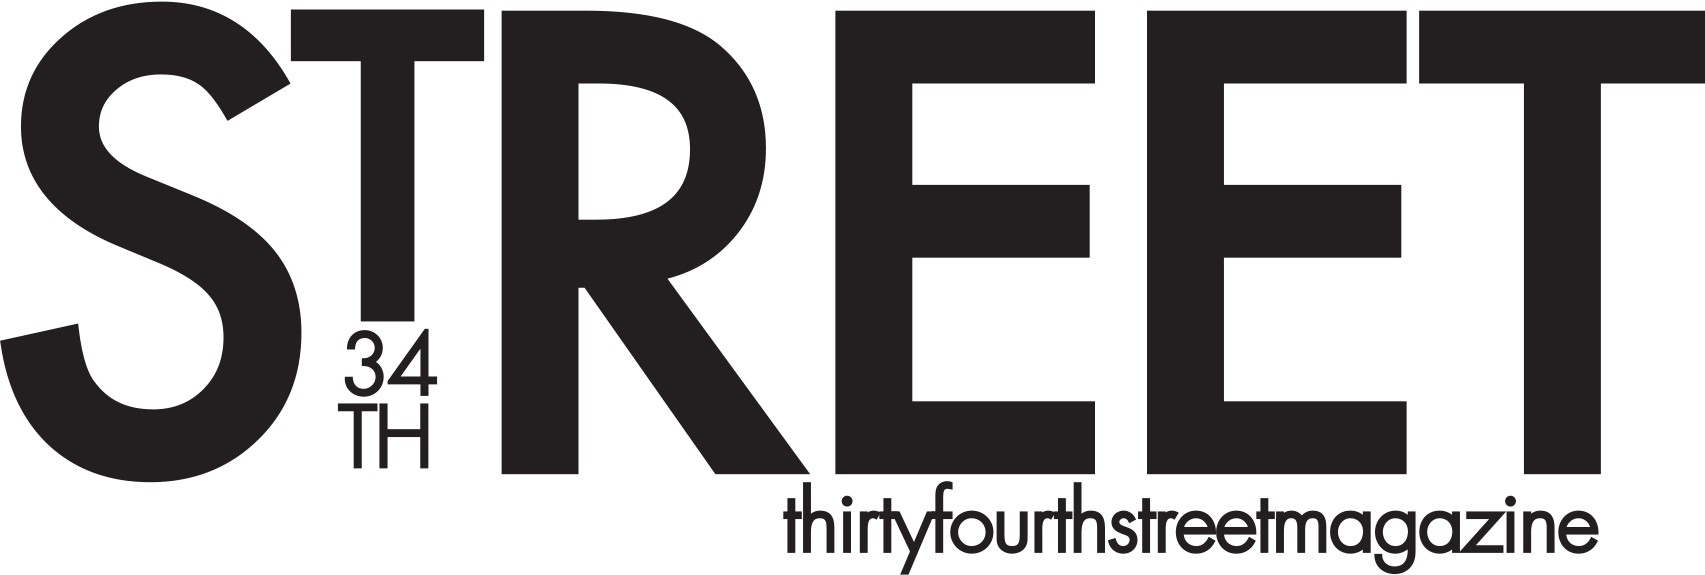 34th Street Magazine logo